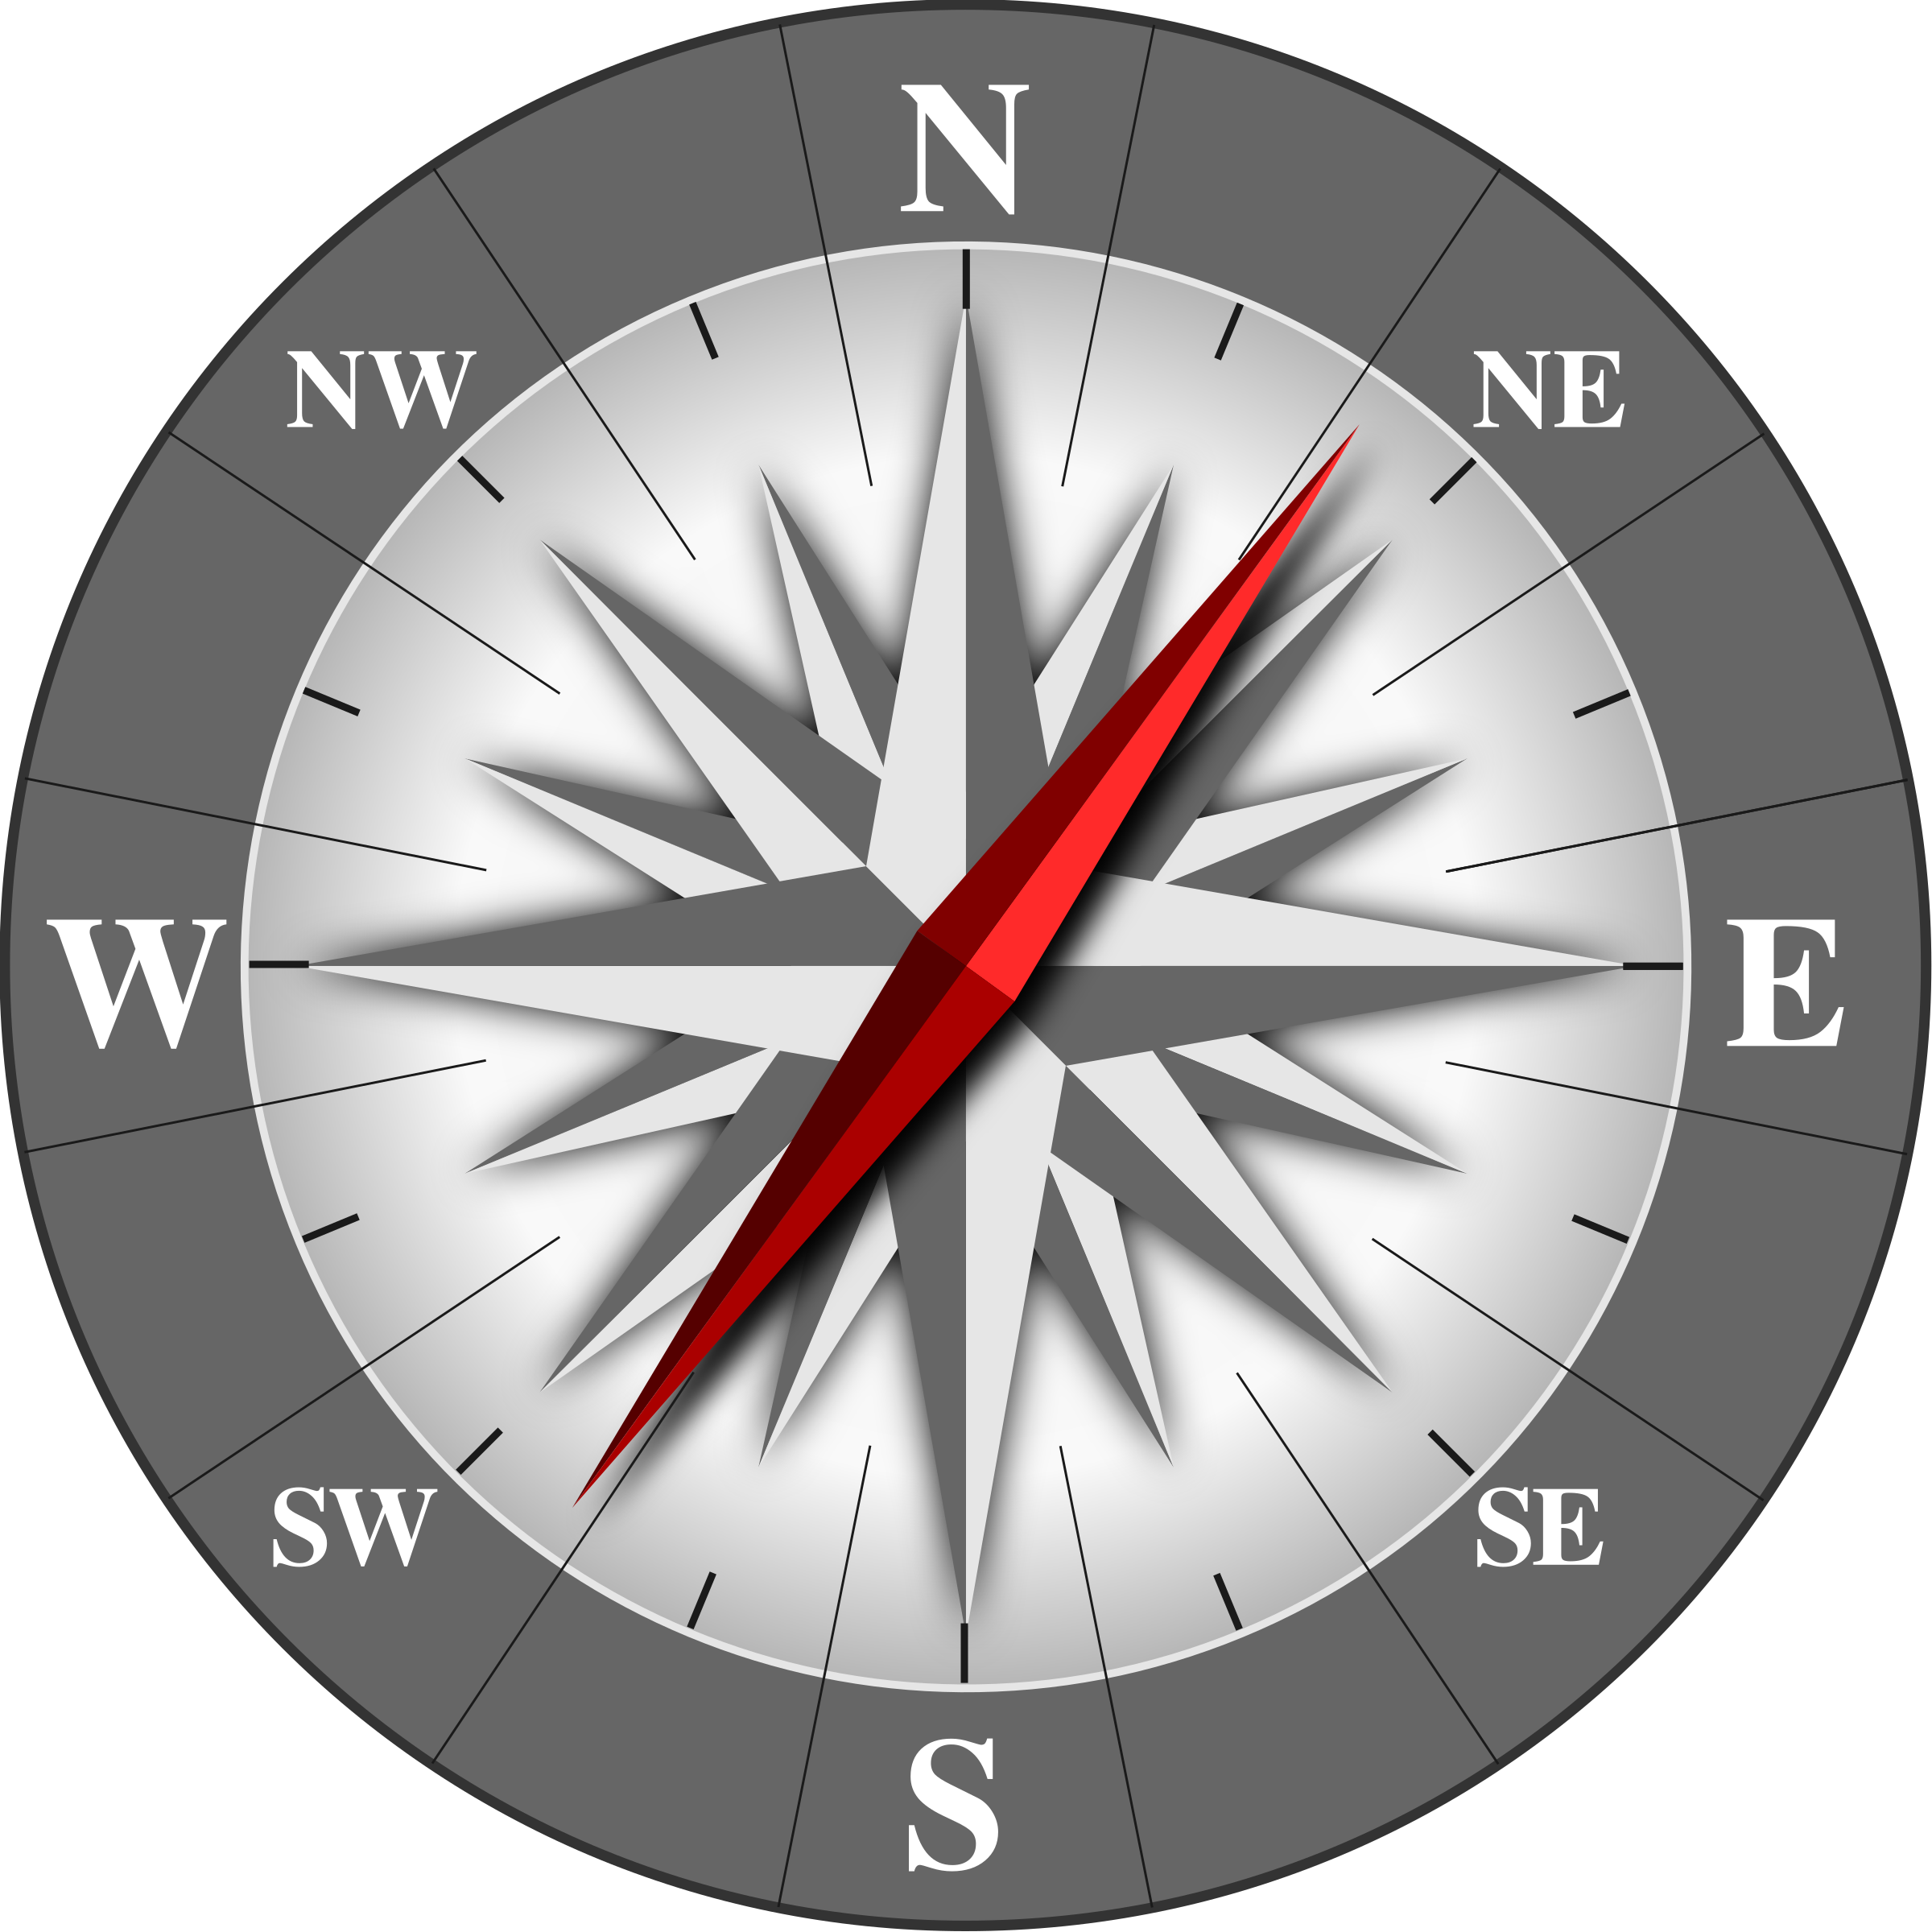 jpg royalty free Clocks clipart compass. Bussola big image png.